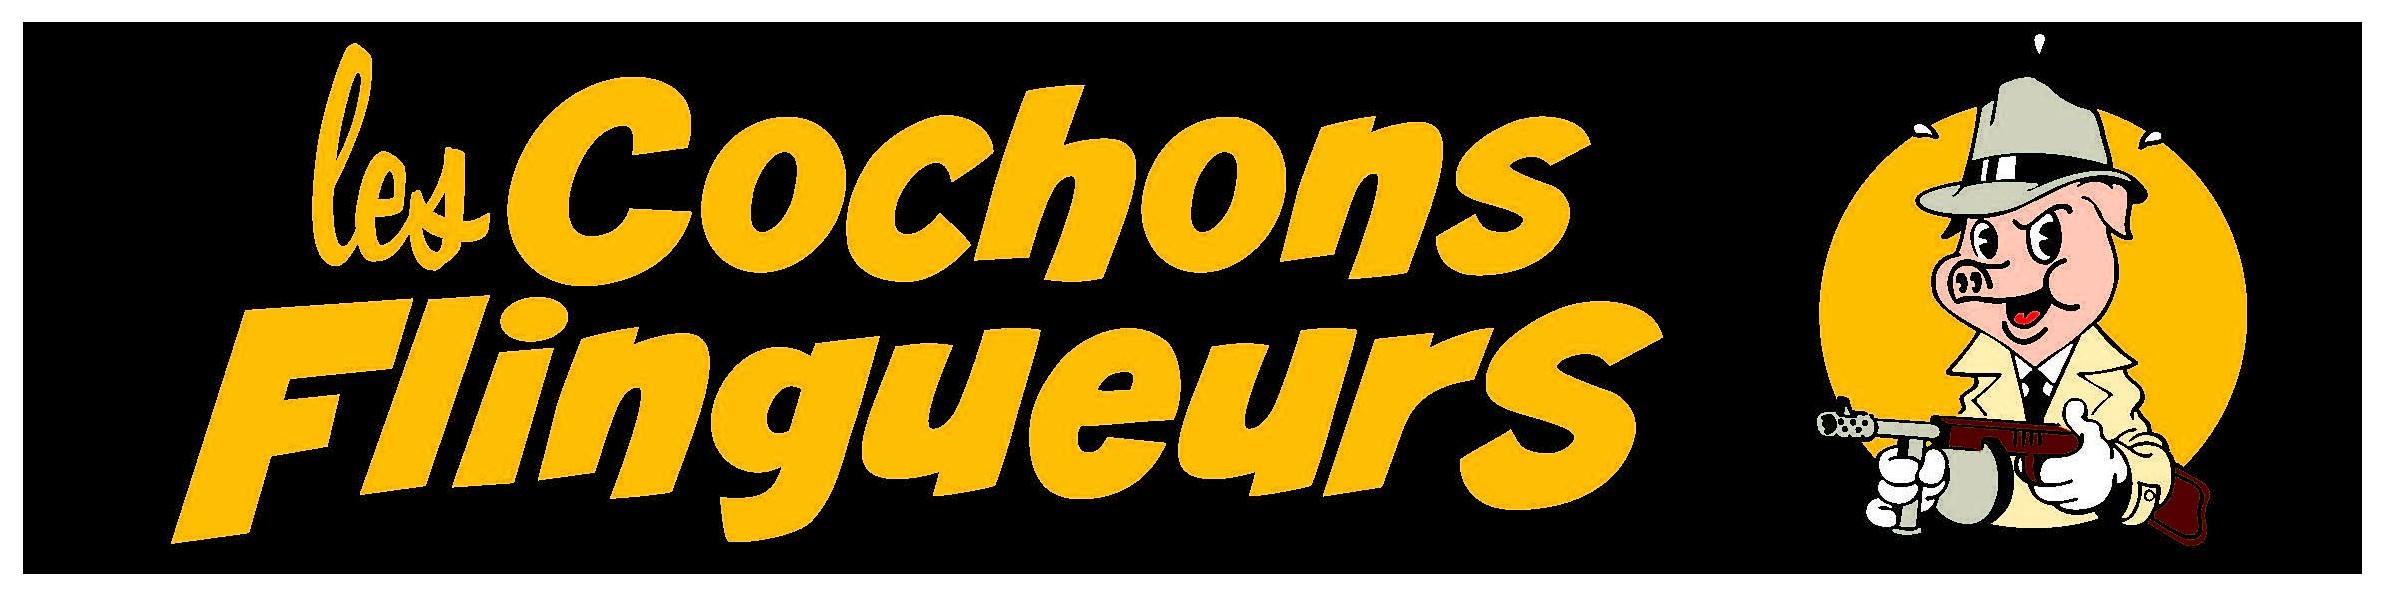 logo cochons flingueurs MC